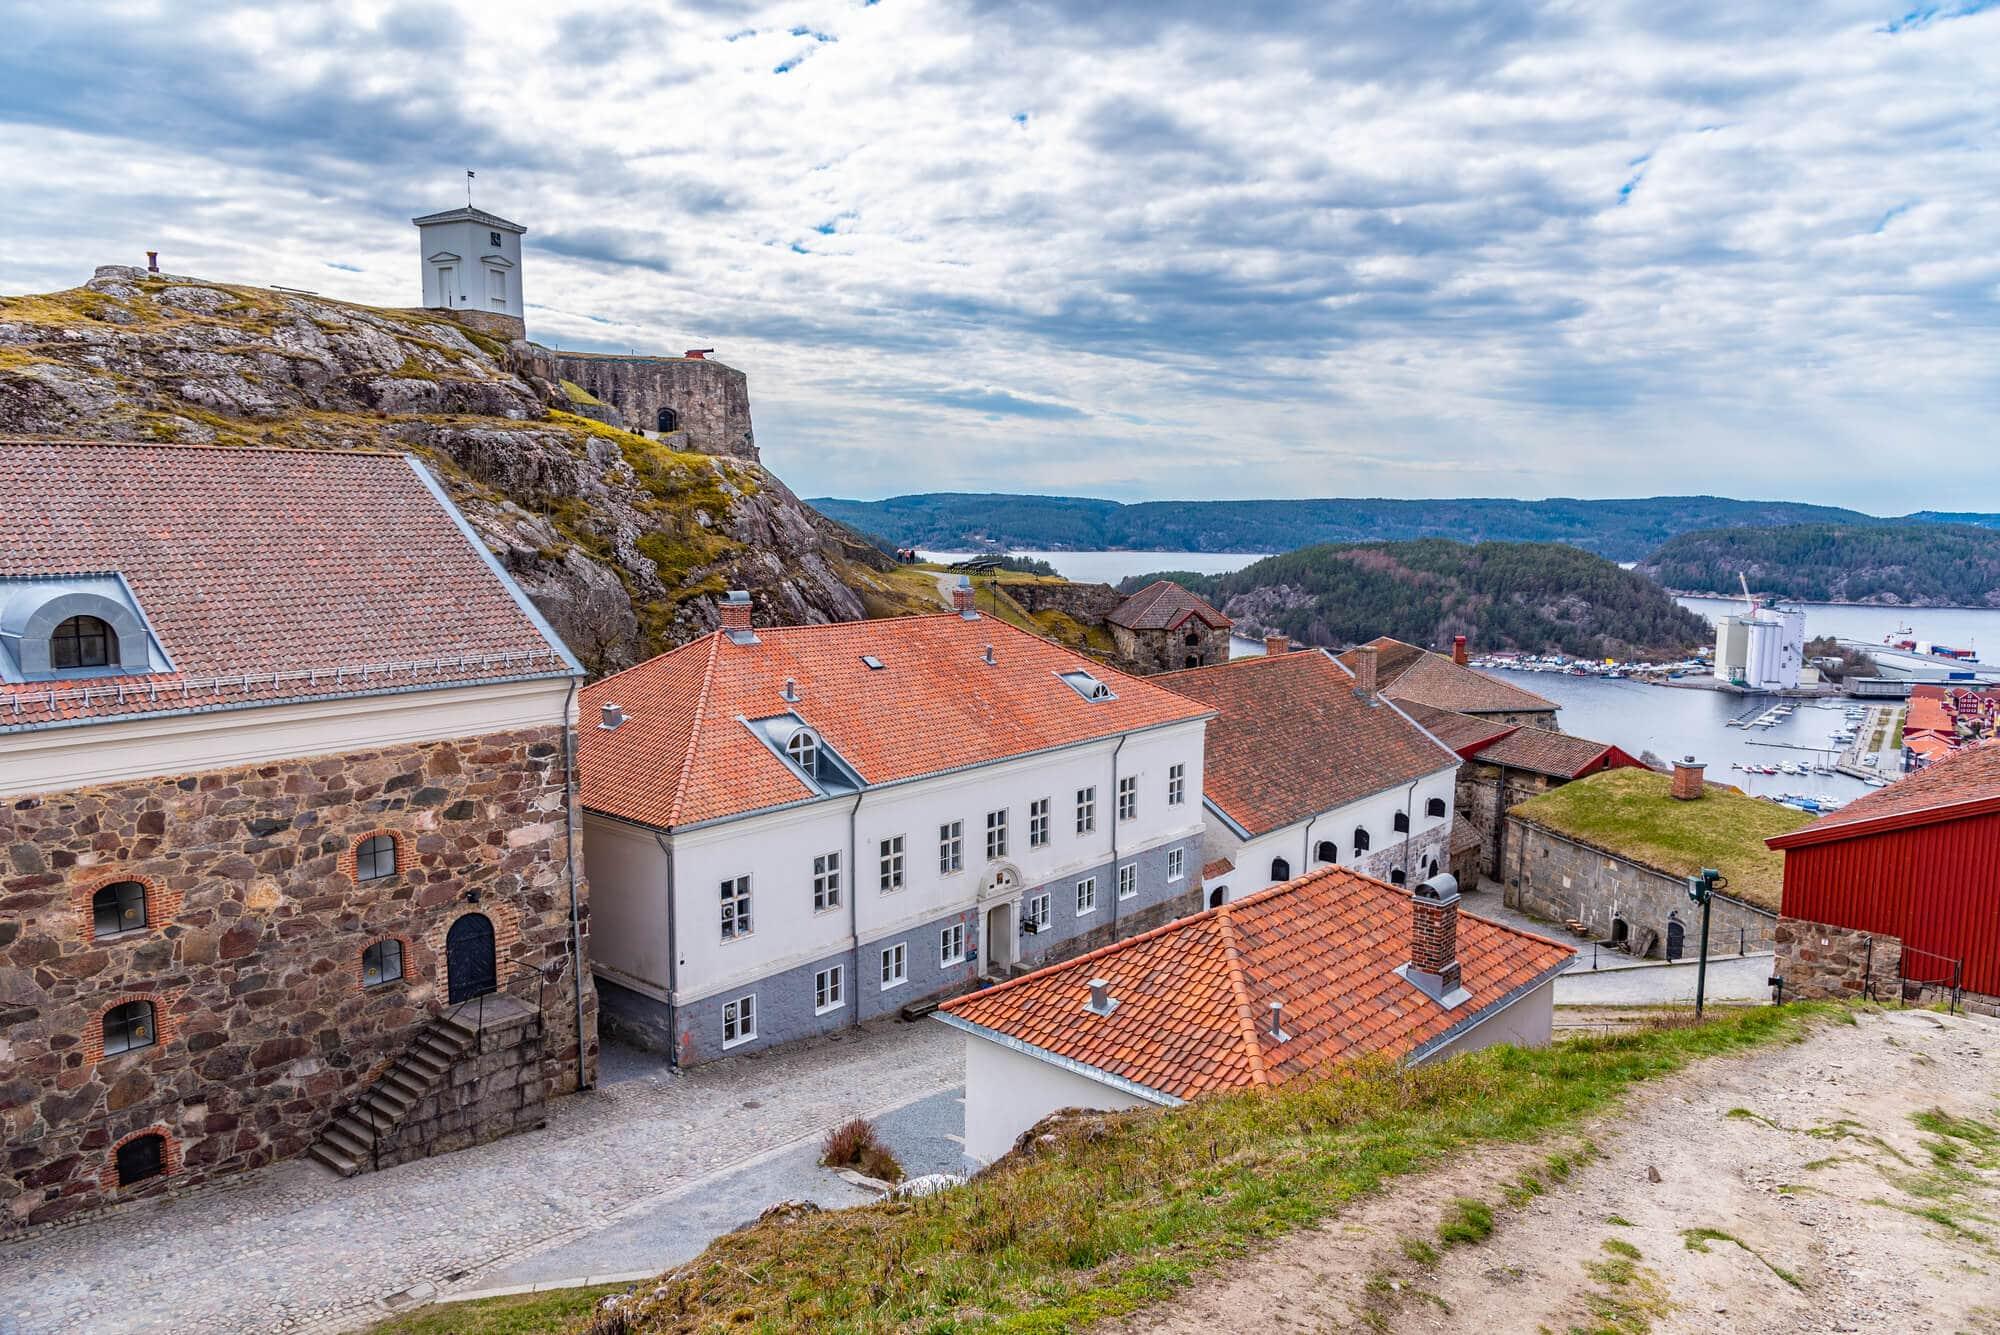 Inner courtyard of Fredriksten Fortress in Halden, Norway